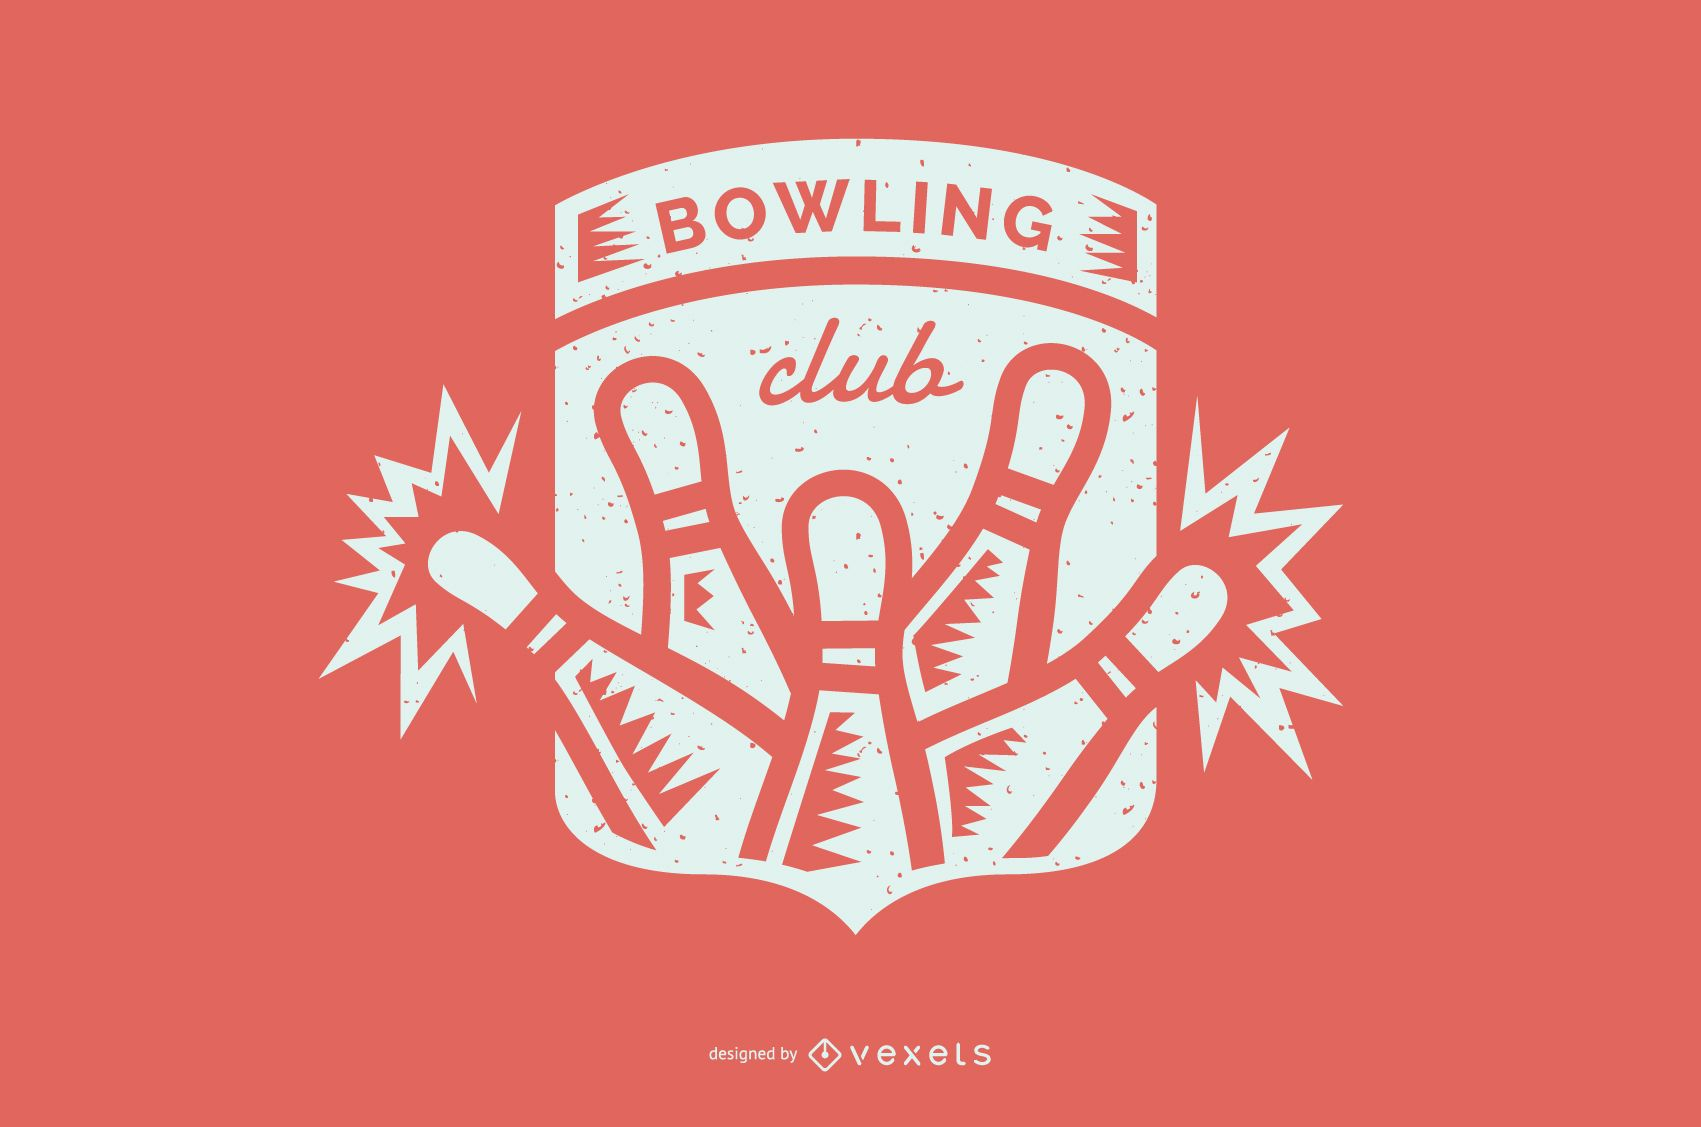 Bowling club badge design